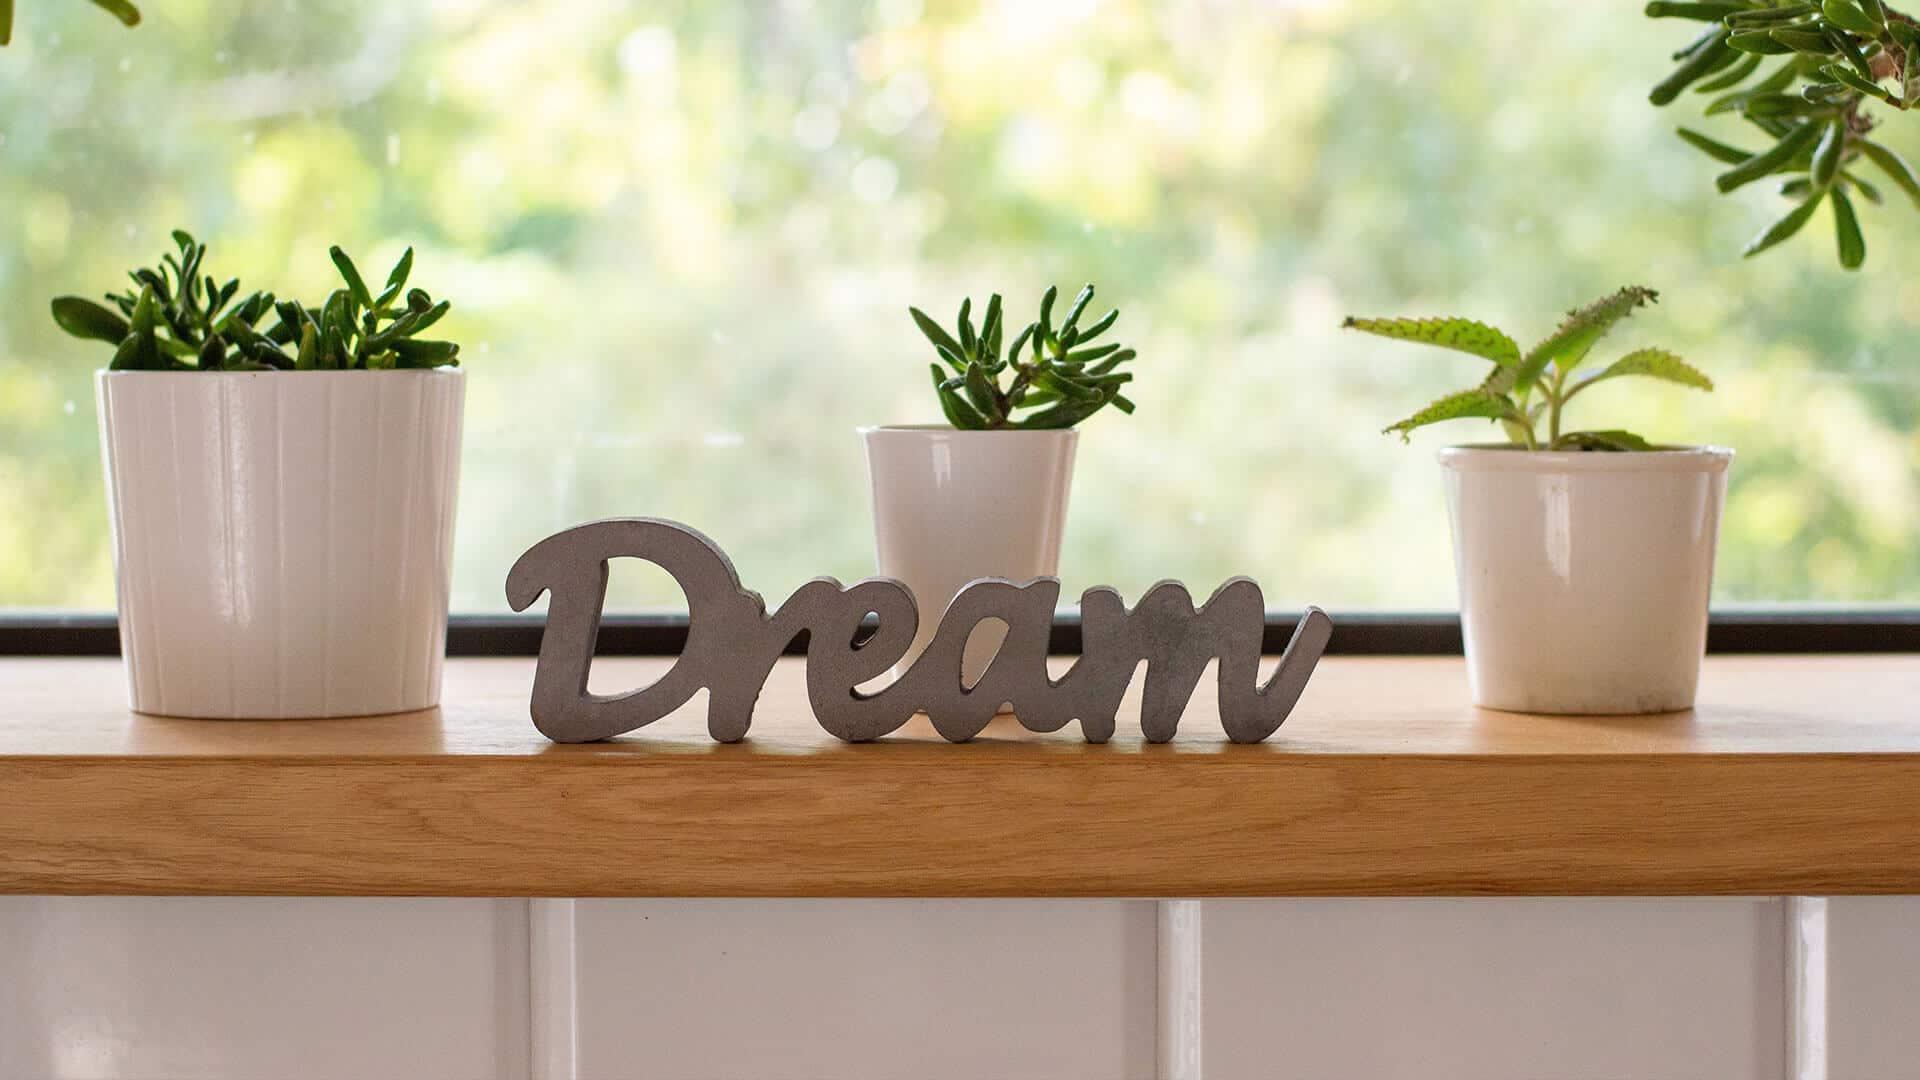 artificial plants decorate dream kitchen